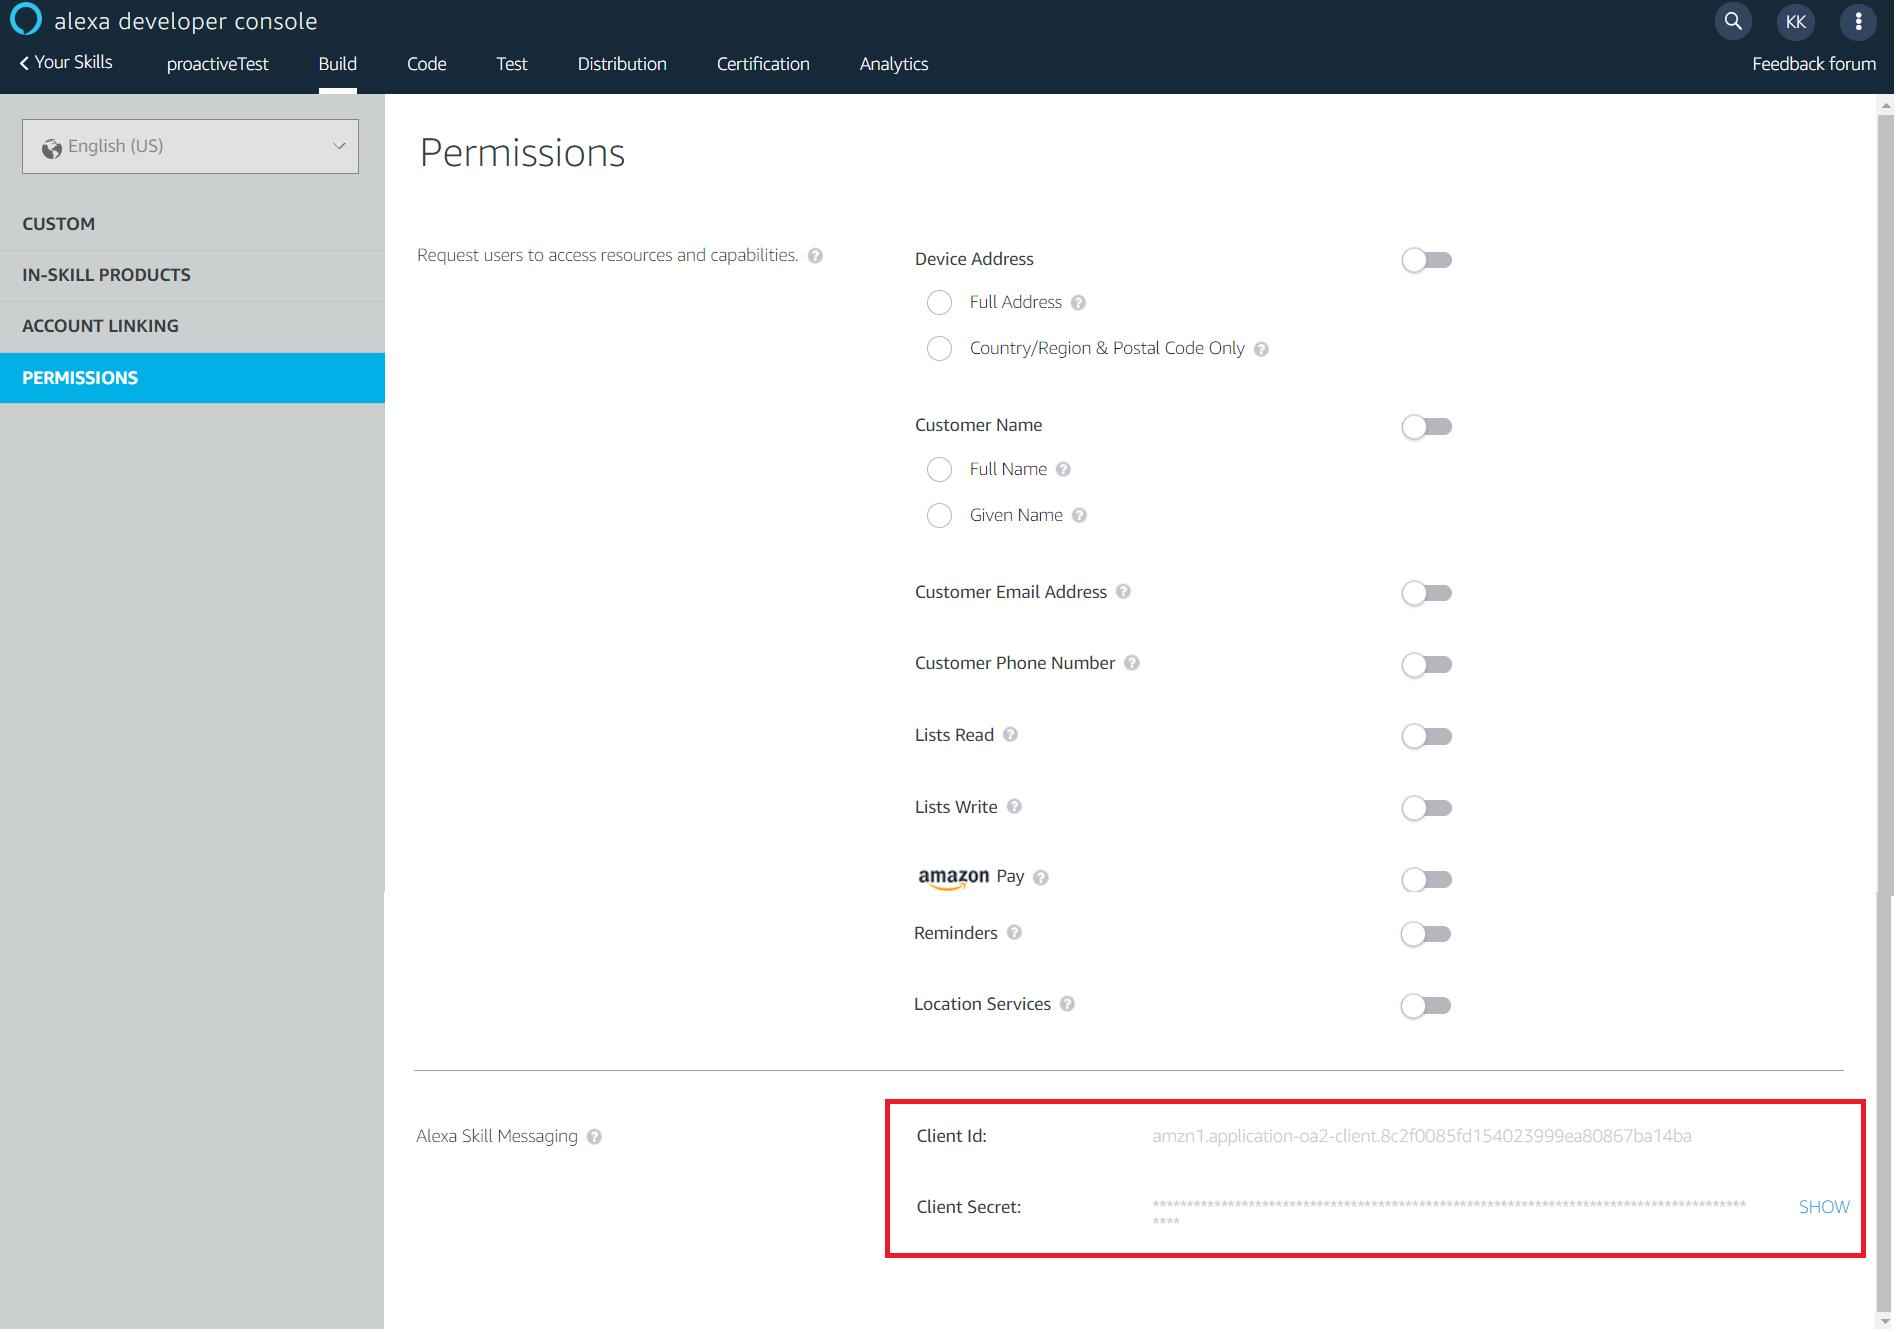 Proactive Events API Client ID and Client Secret